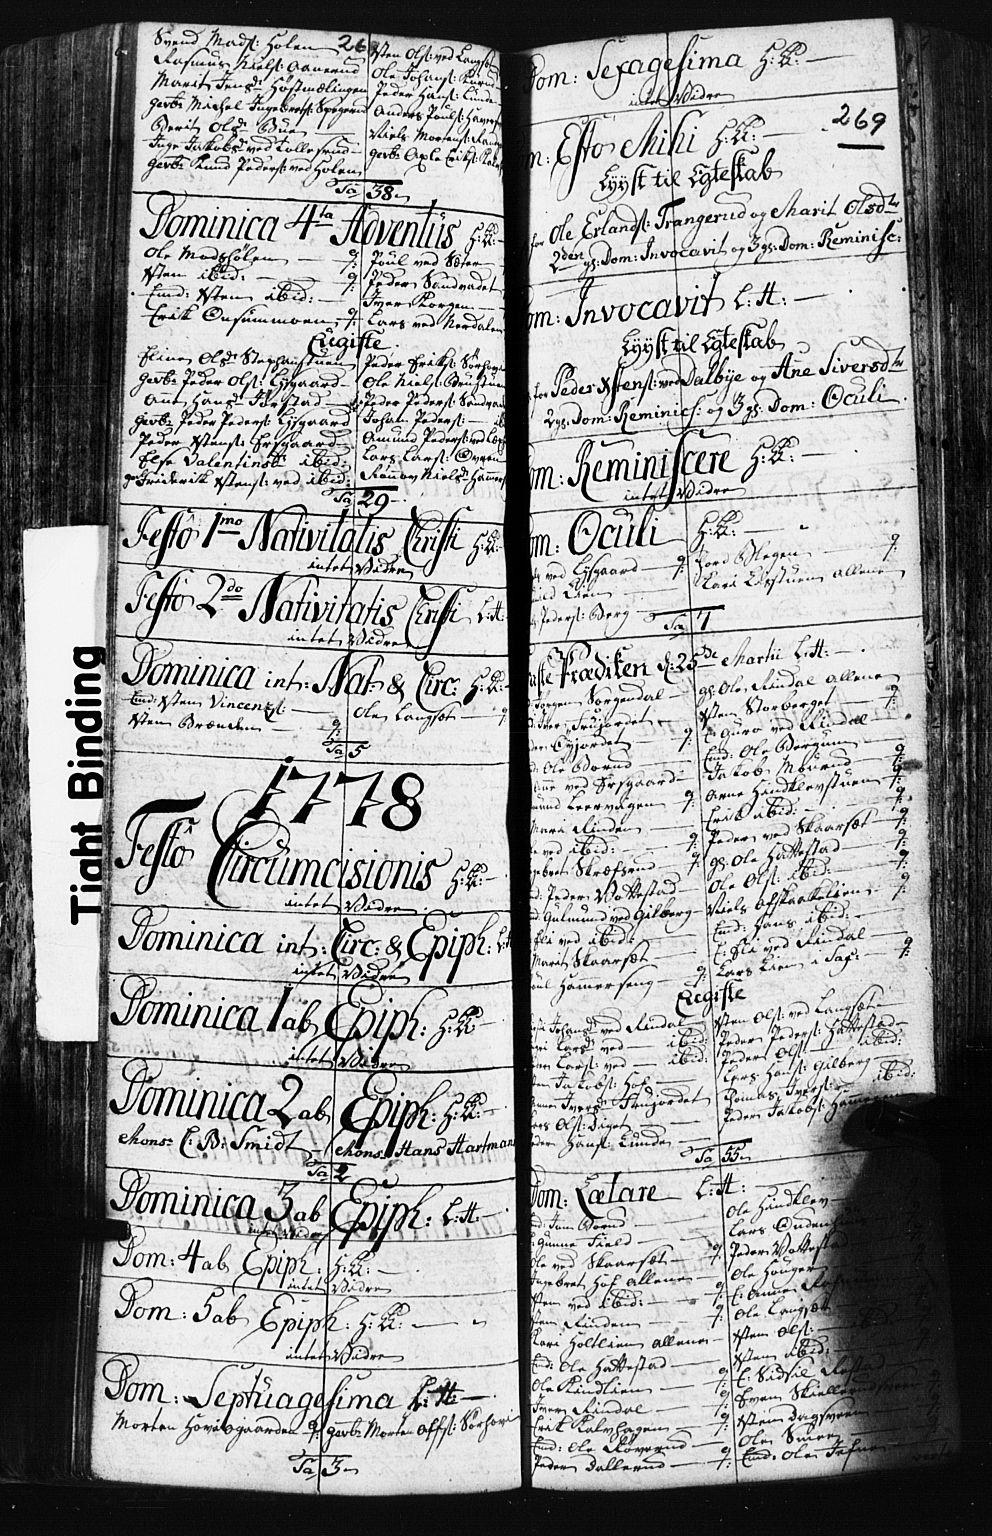 SAH, Fåberg prestekontor, Klokkerbok nr. 3, 1768-1796, s. 268-269